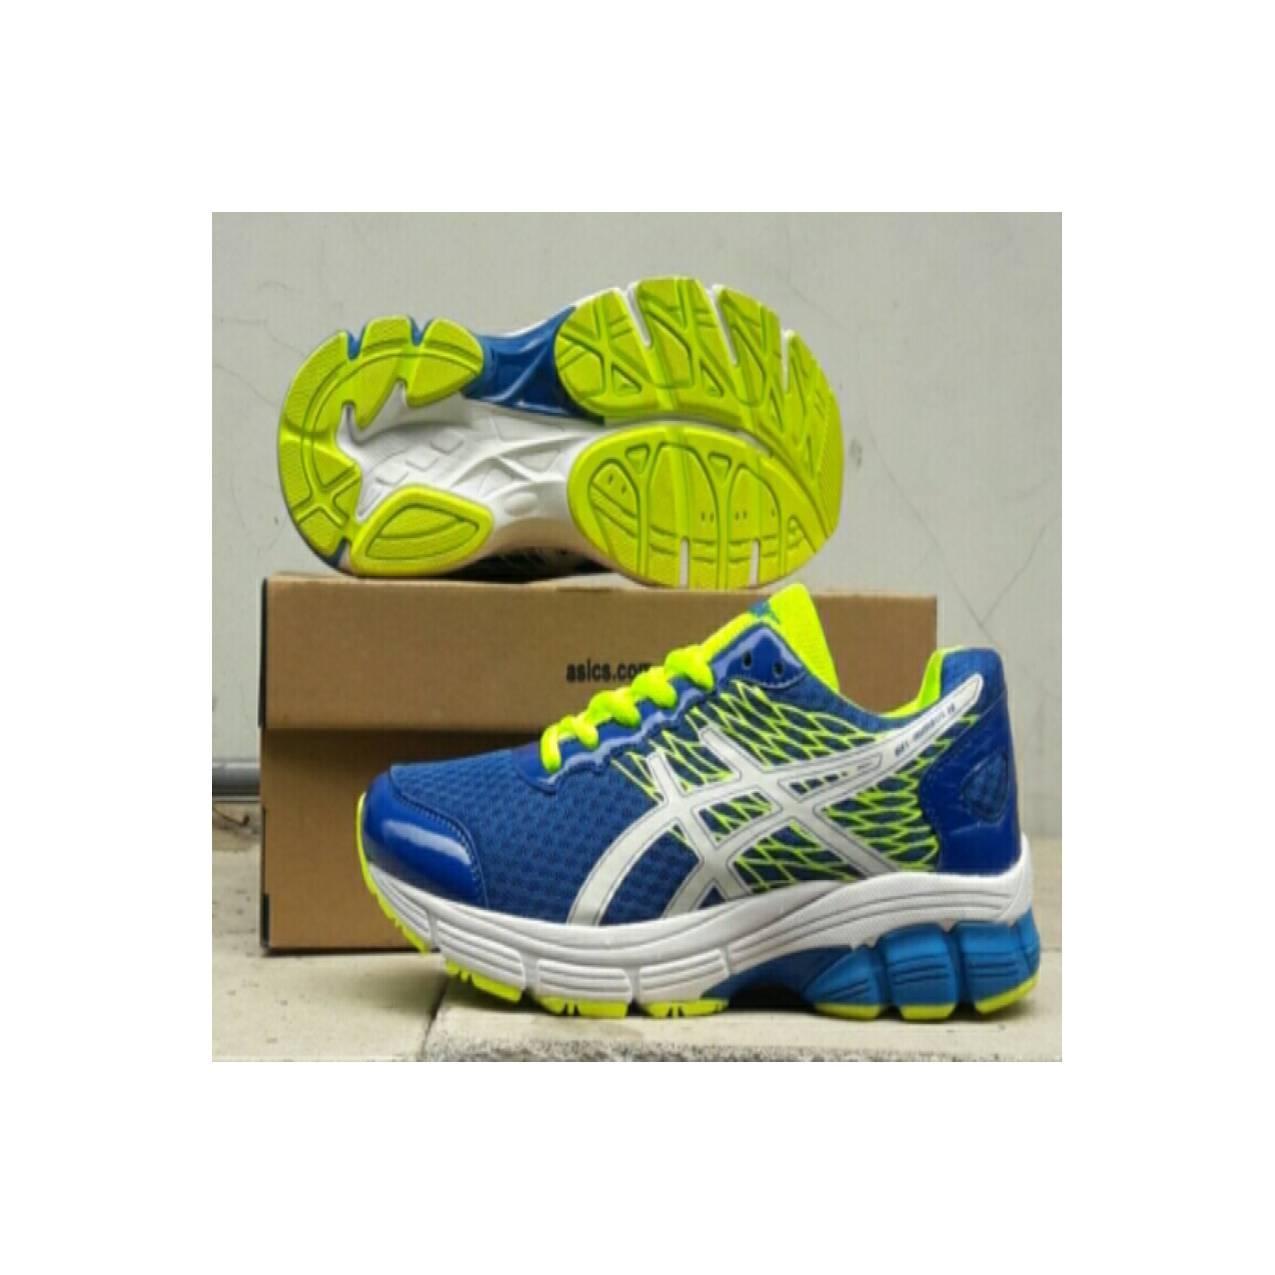 Sepatu Asics Volly Tenis Gel Nimbus